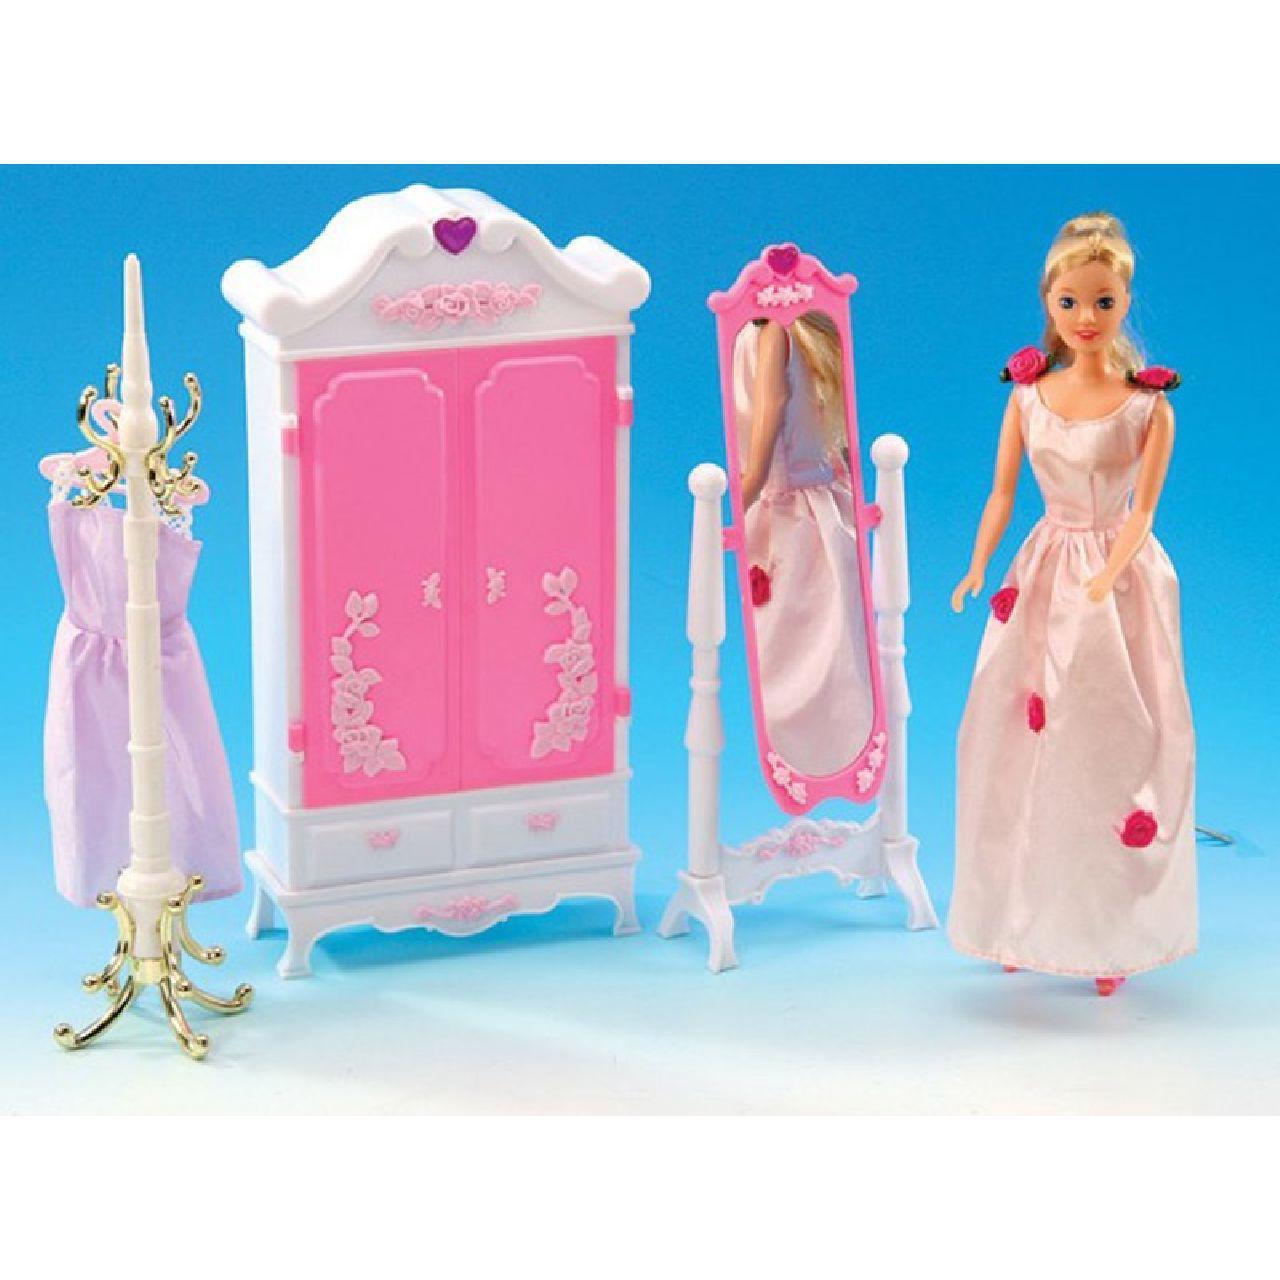 Мебель для кукол Gloria 2609 Гардеробная комната шкаф,зеркало.вешалка д/одежды, в кор.